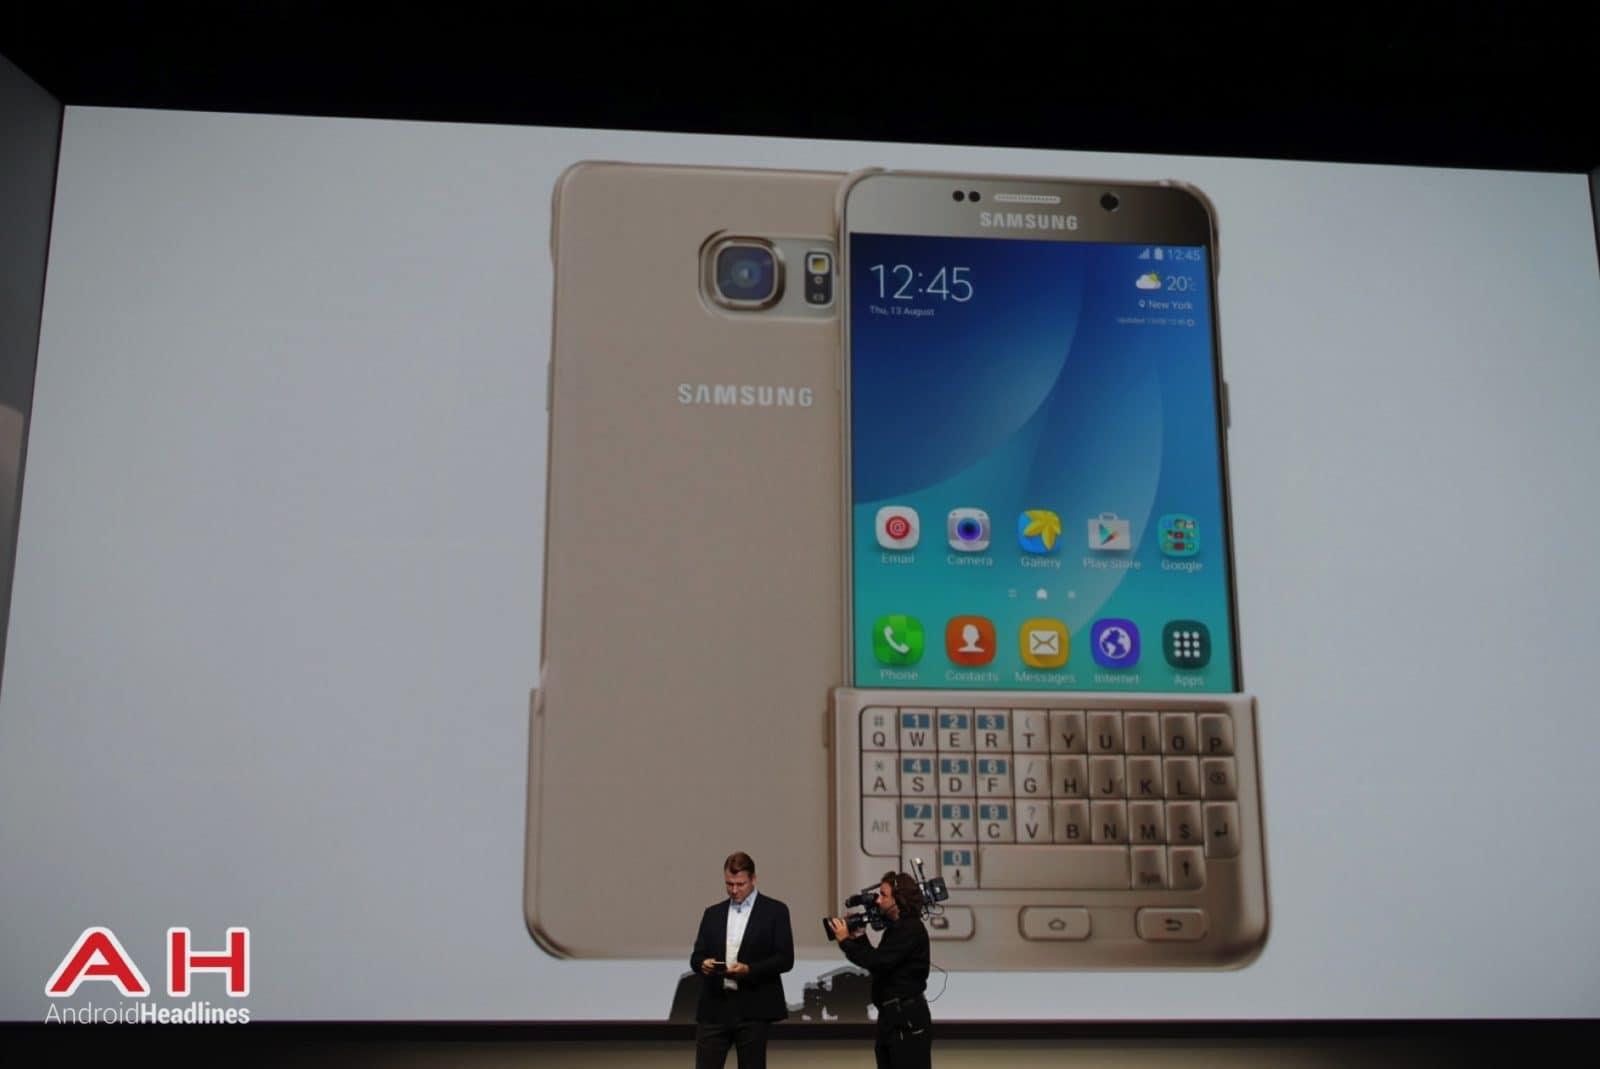 Samsung Unpacked 15 AH 20